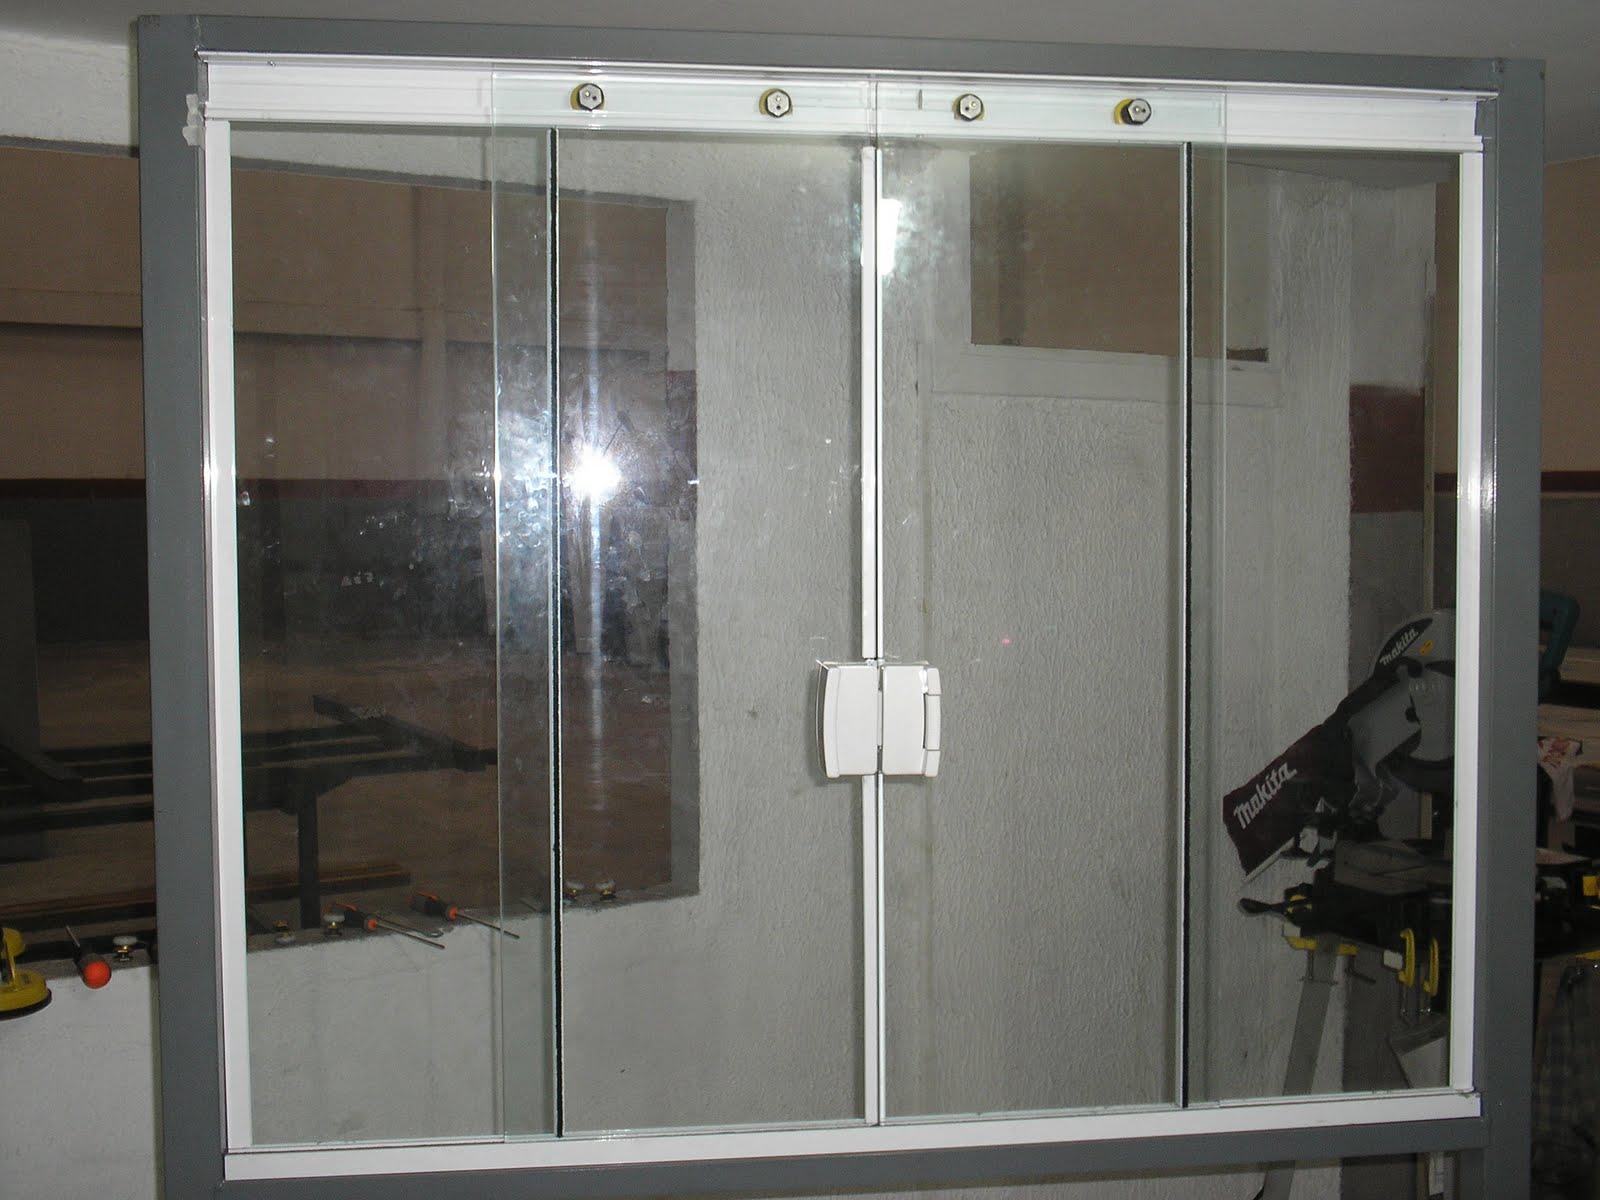 #594F42 Alumiglass Vidraçaria: Janelas em Vidro Temperado 350 Janelas De Vidro Temperado Preço Rj